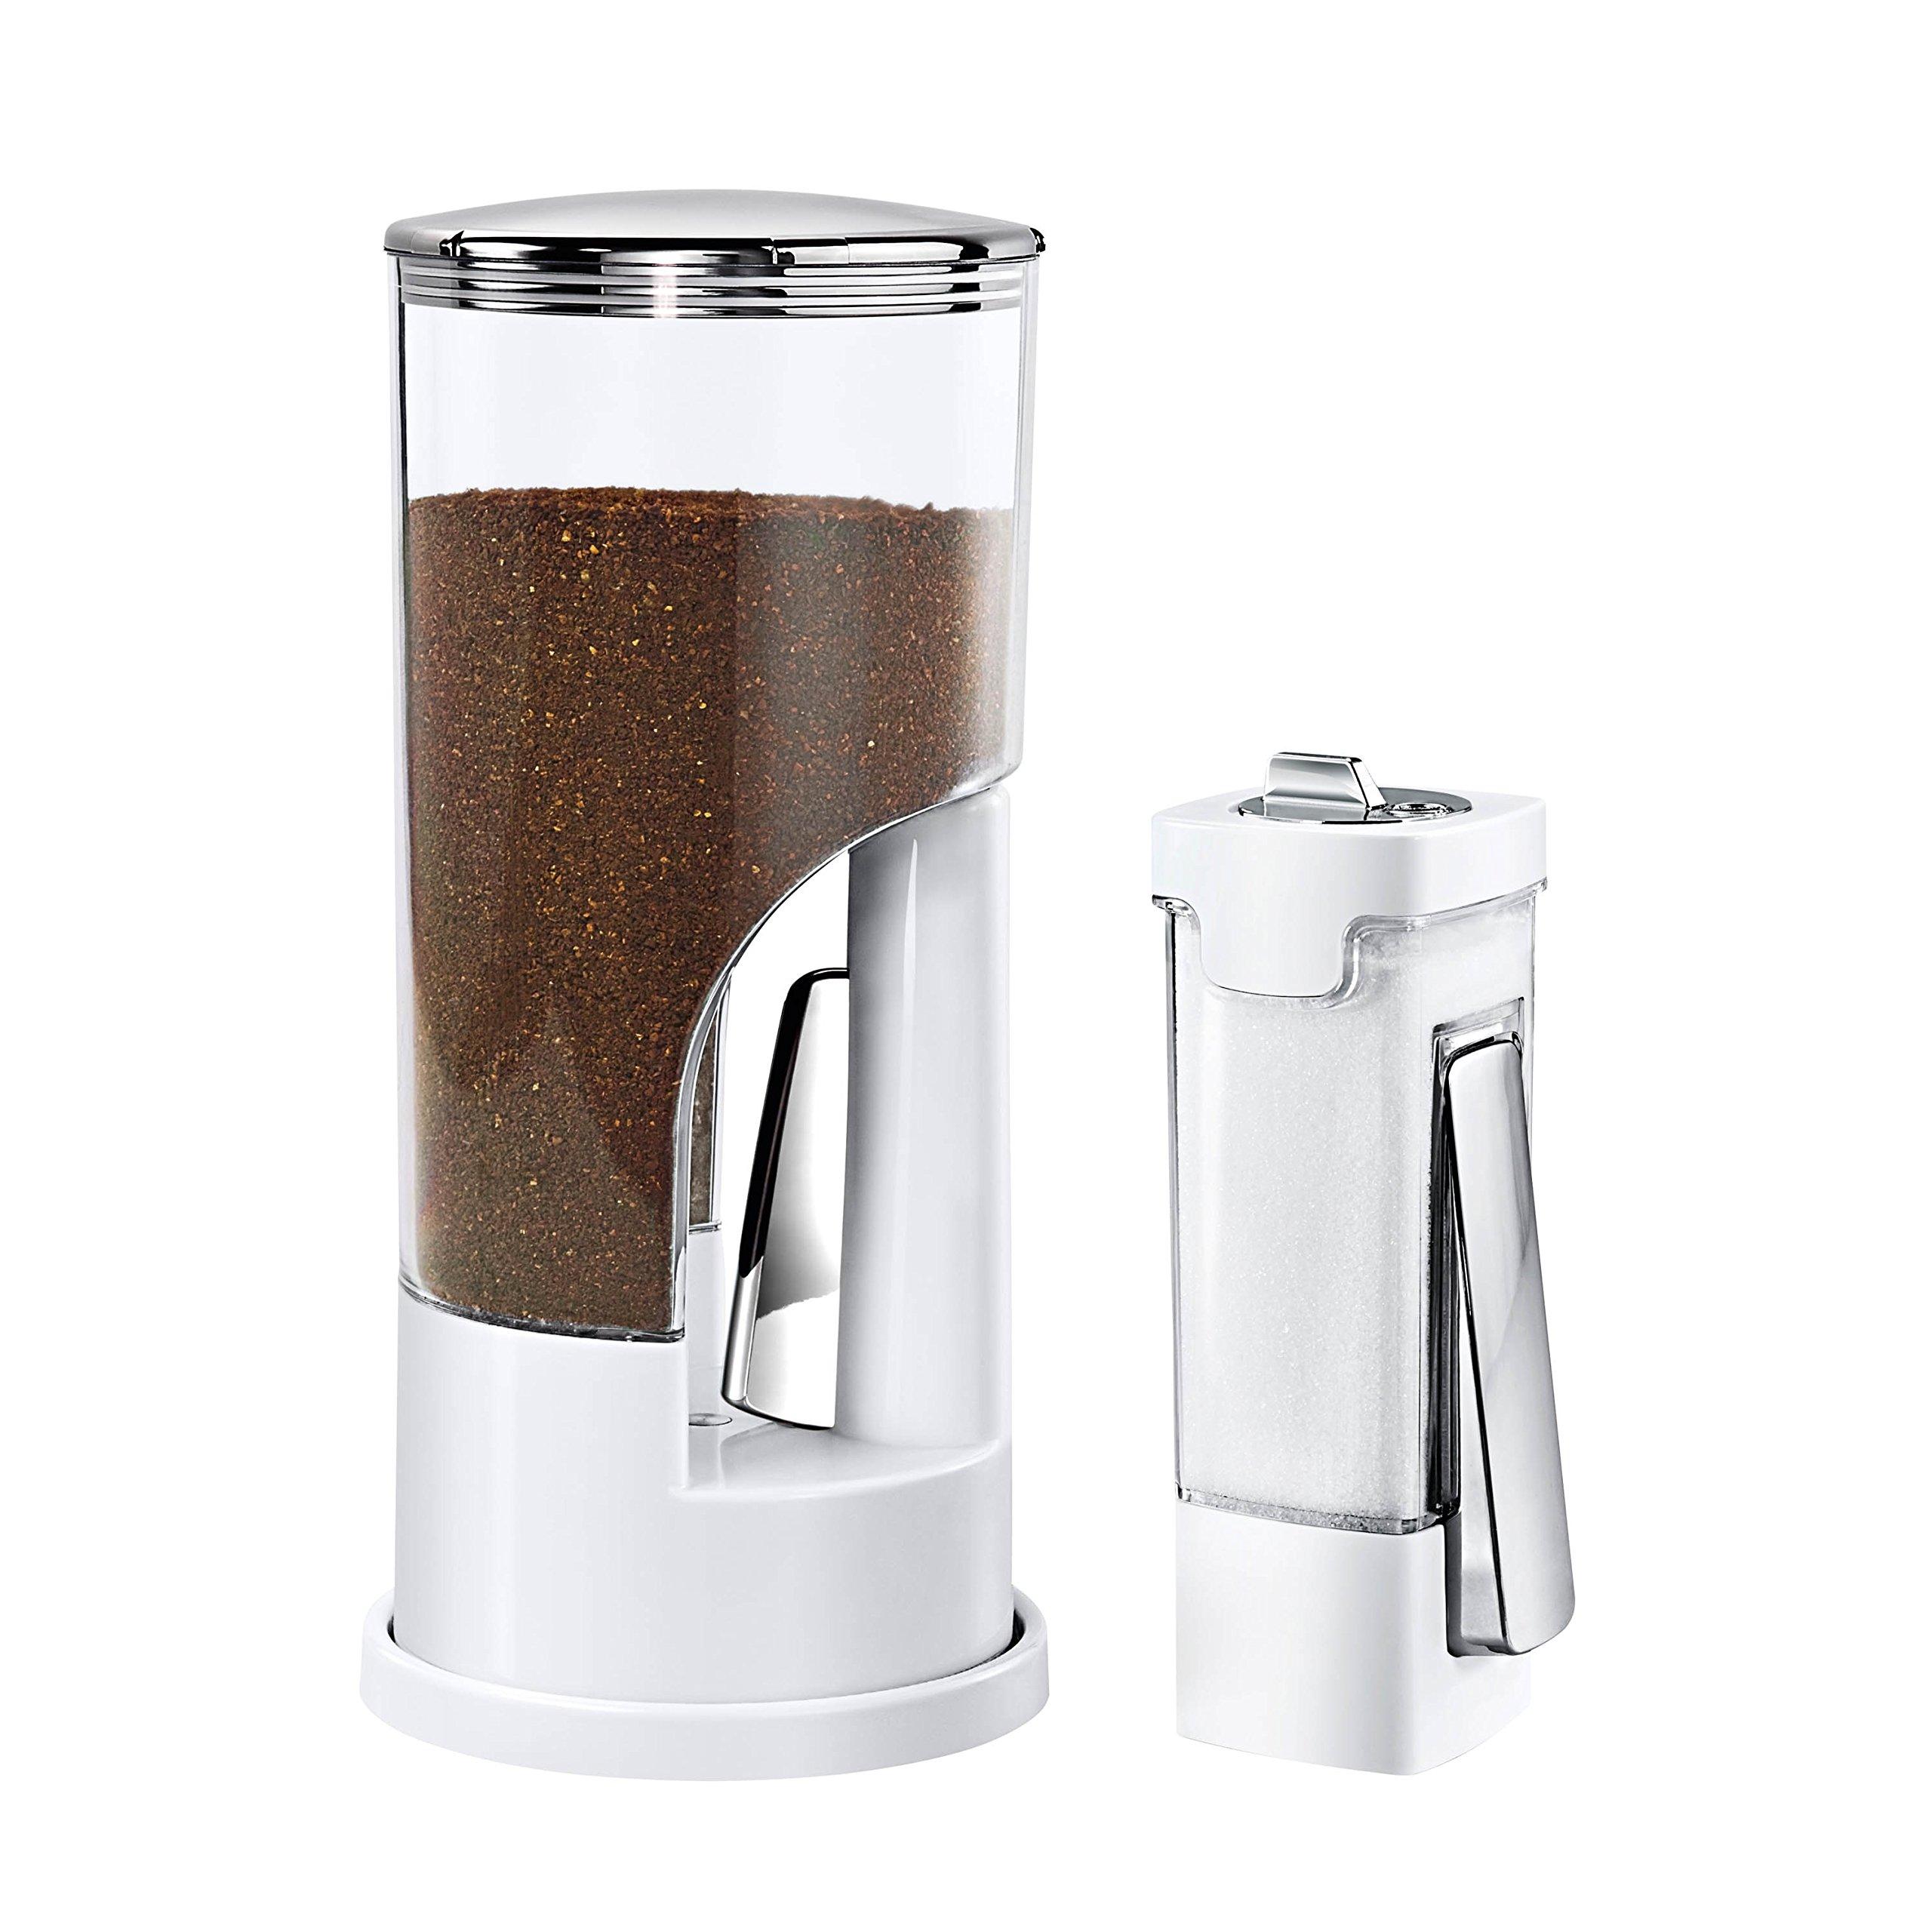 Honey-Can-Do KCHX06081 Coffee Dispenser & Sugar Dispenser Set by Honey-Can-Do